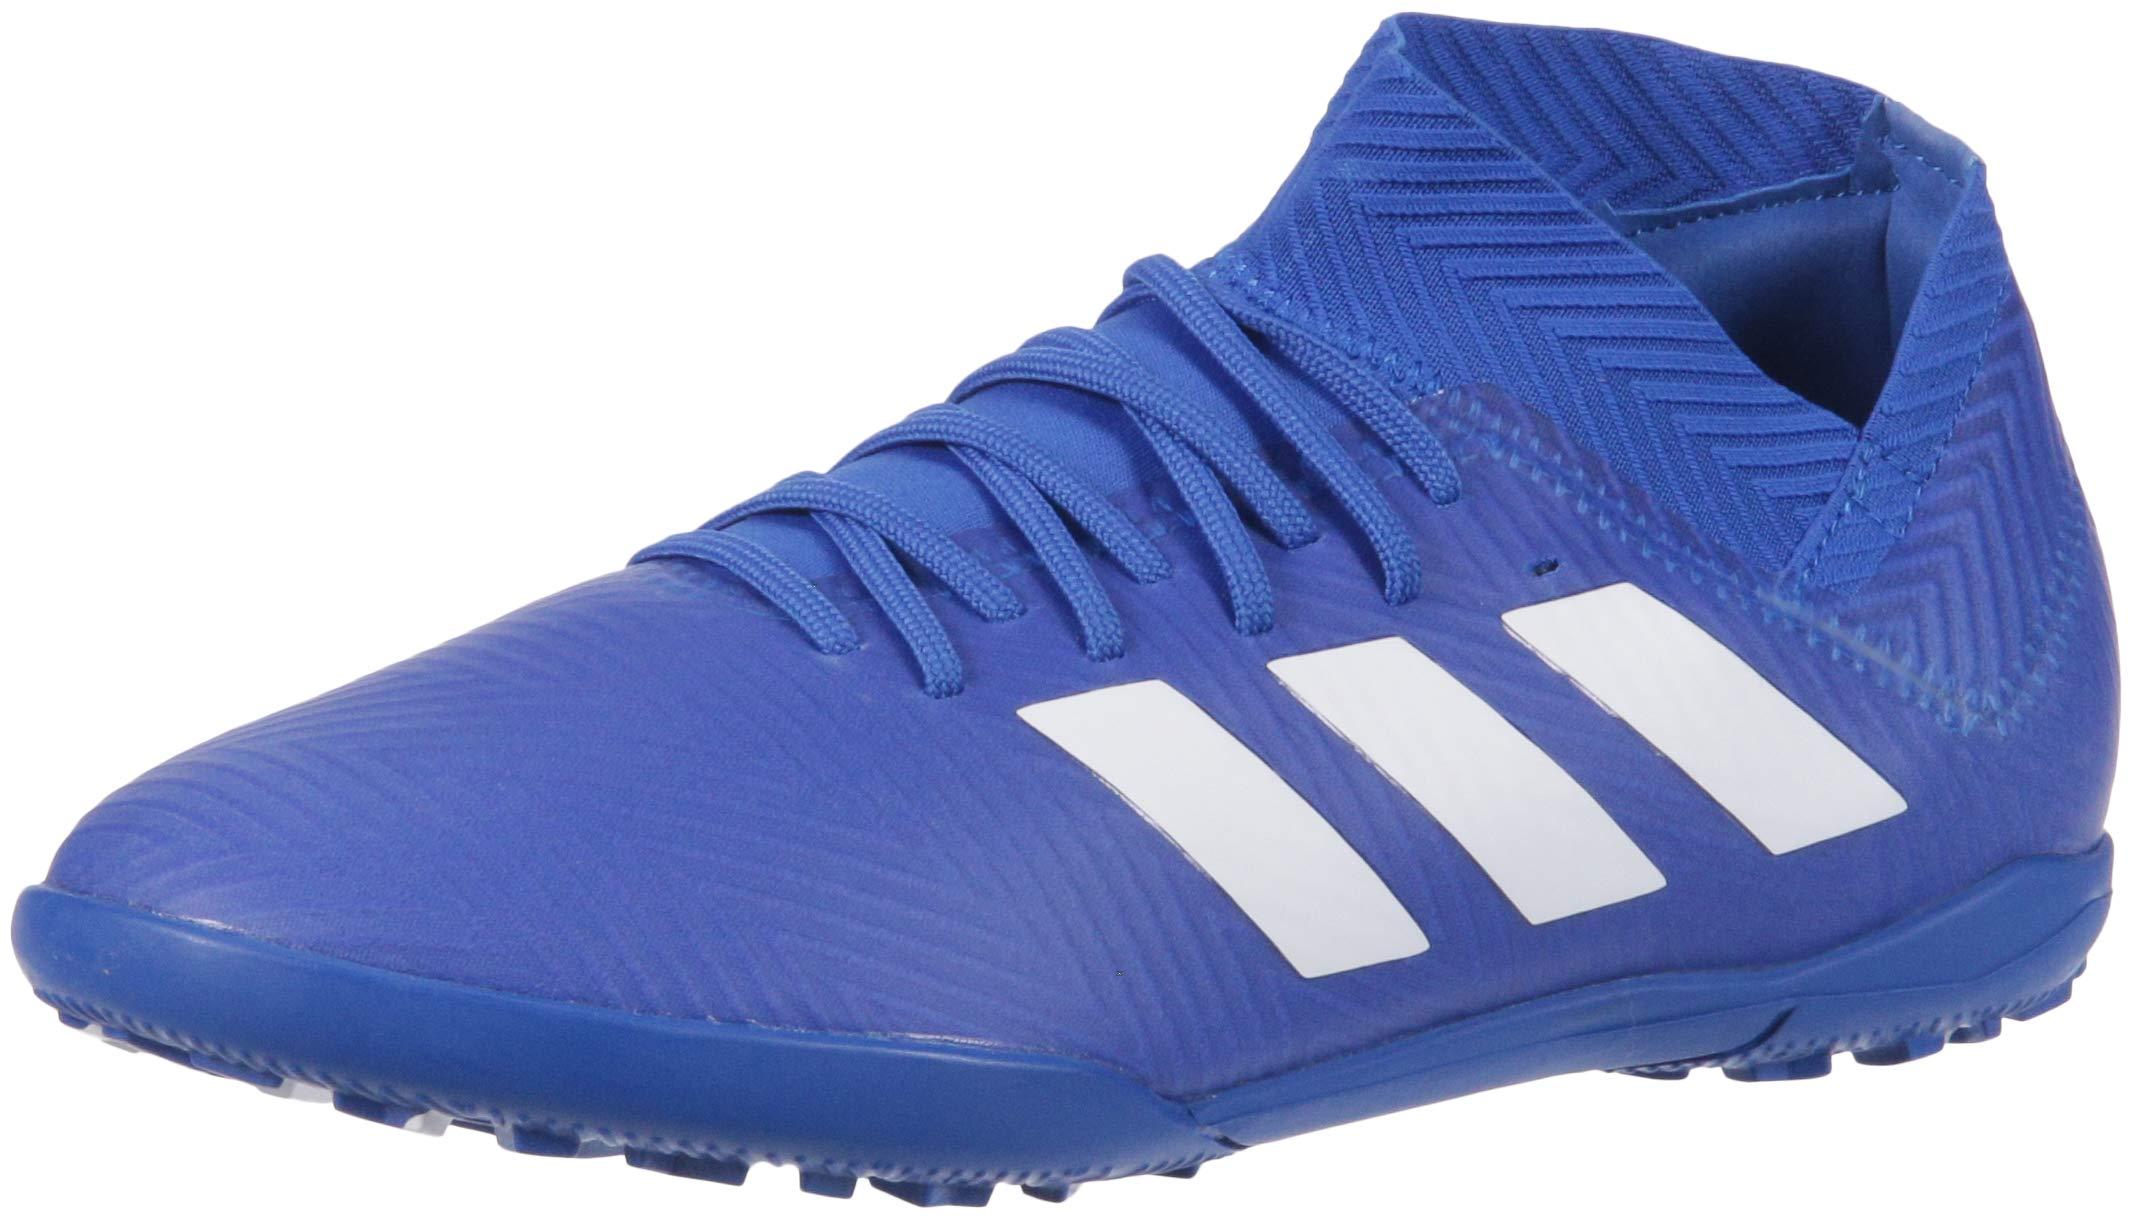 adidas Unisex Nemeziz Tango 18.3 Turf Soccer Shoe White/Football Blue, 5.5 M US Big Kid